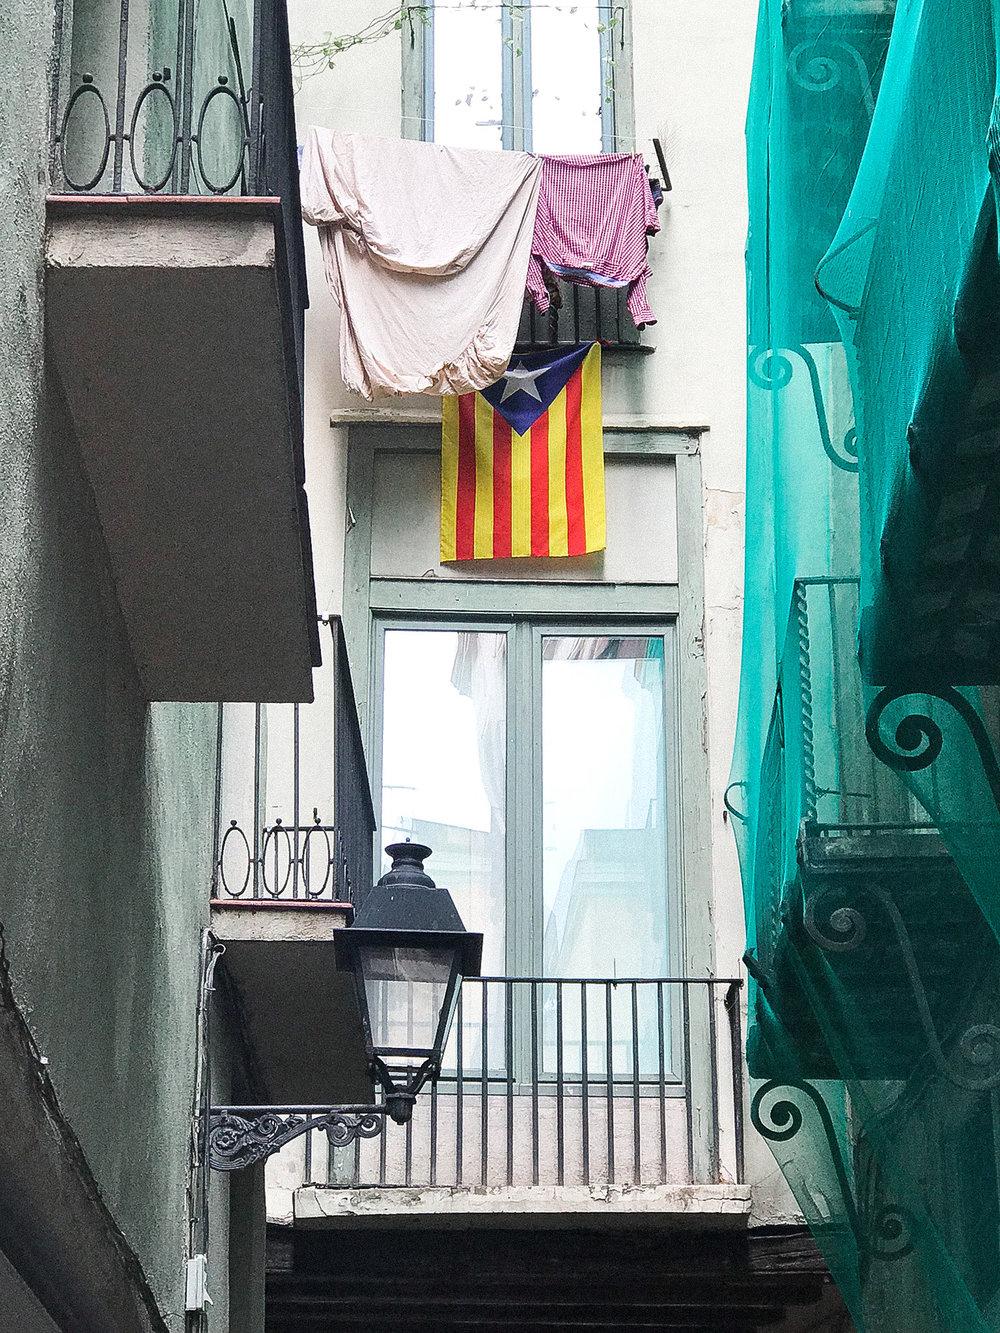 sheilaburgos-barcelona-callejon-bandera.jpg